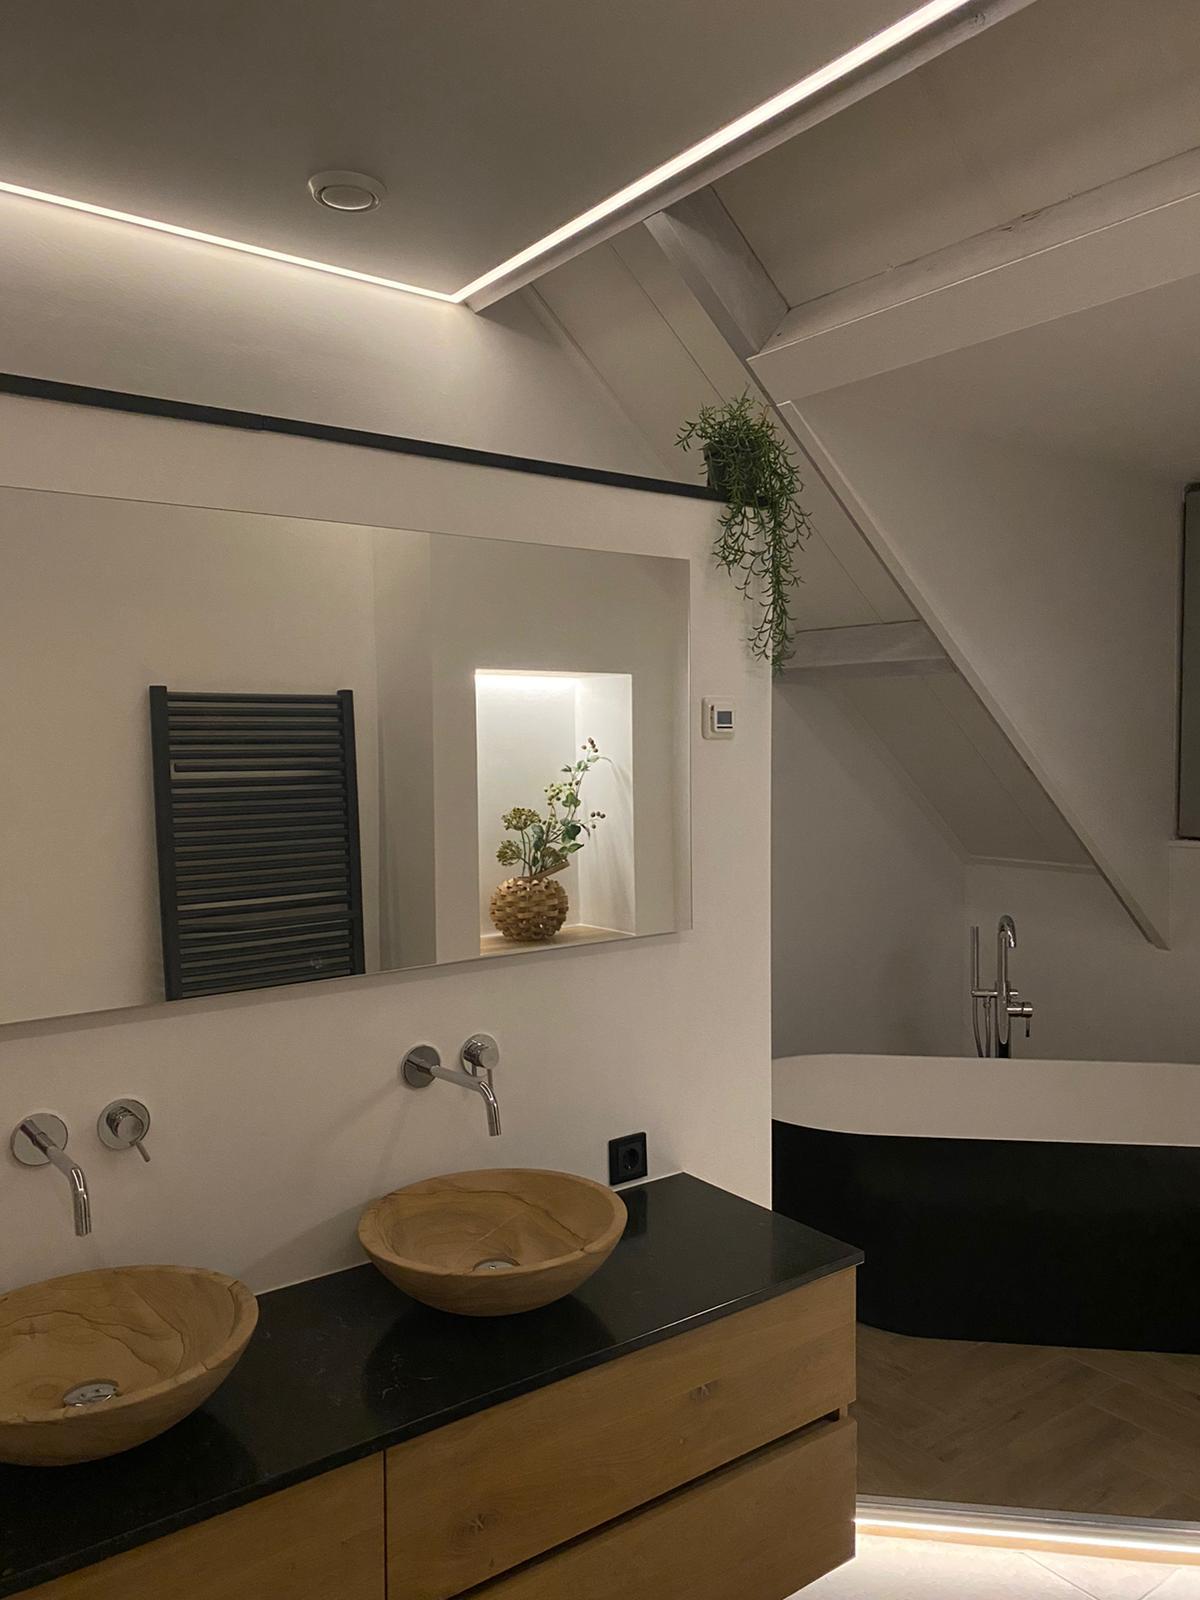 schuine wand plafond met LED verlichting